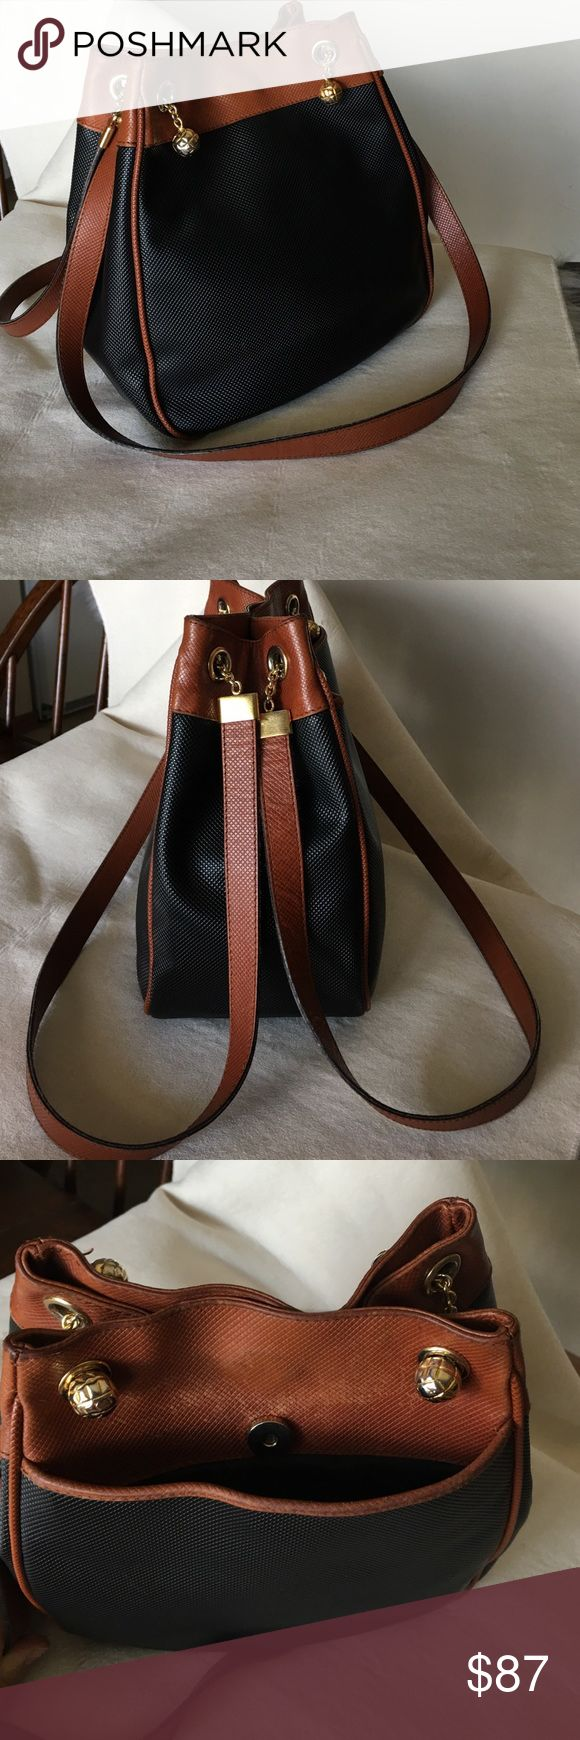 "BOTTEGA VENETA MARCO POLO BAG Autentic,in very good condition .  Measurements: H 11"" ,W 7,5"" upper part ,9,5"" bottom p ,D 5,5"" Handle drop 16"" Bottega Veneta Bags"